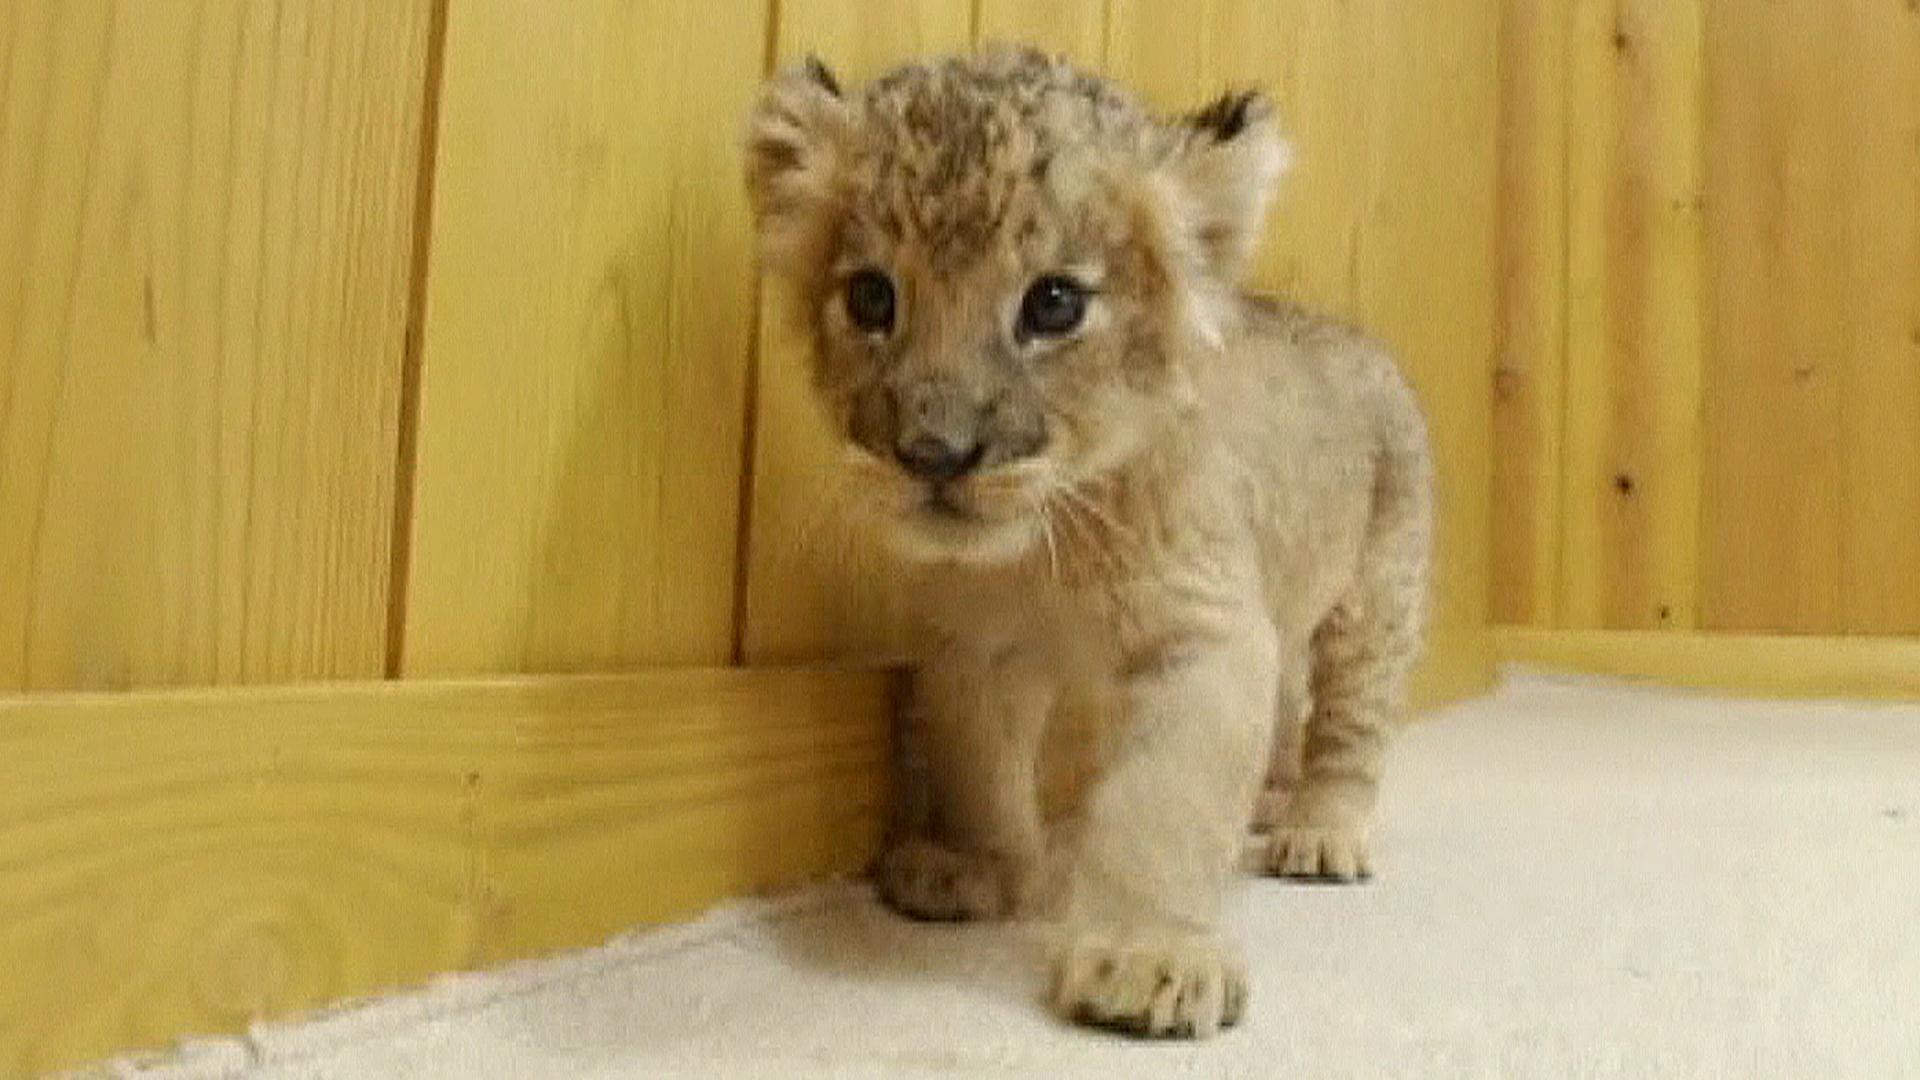 Newborn Lions Play for the Camera - NBC News